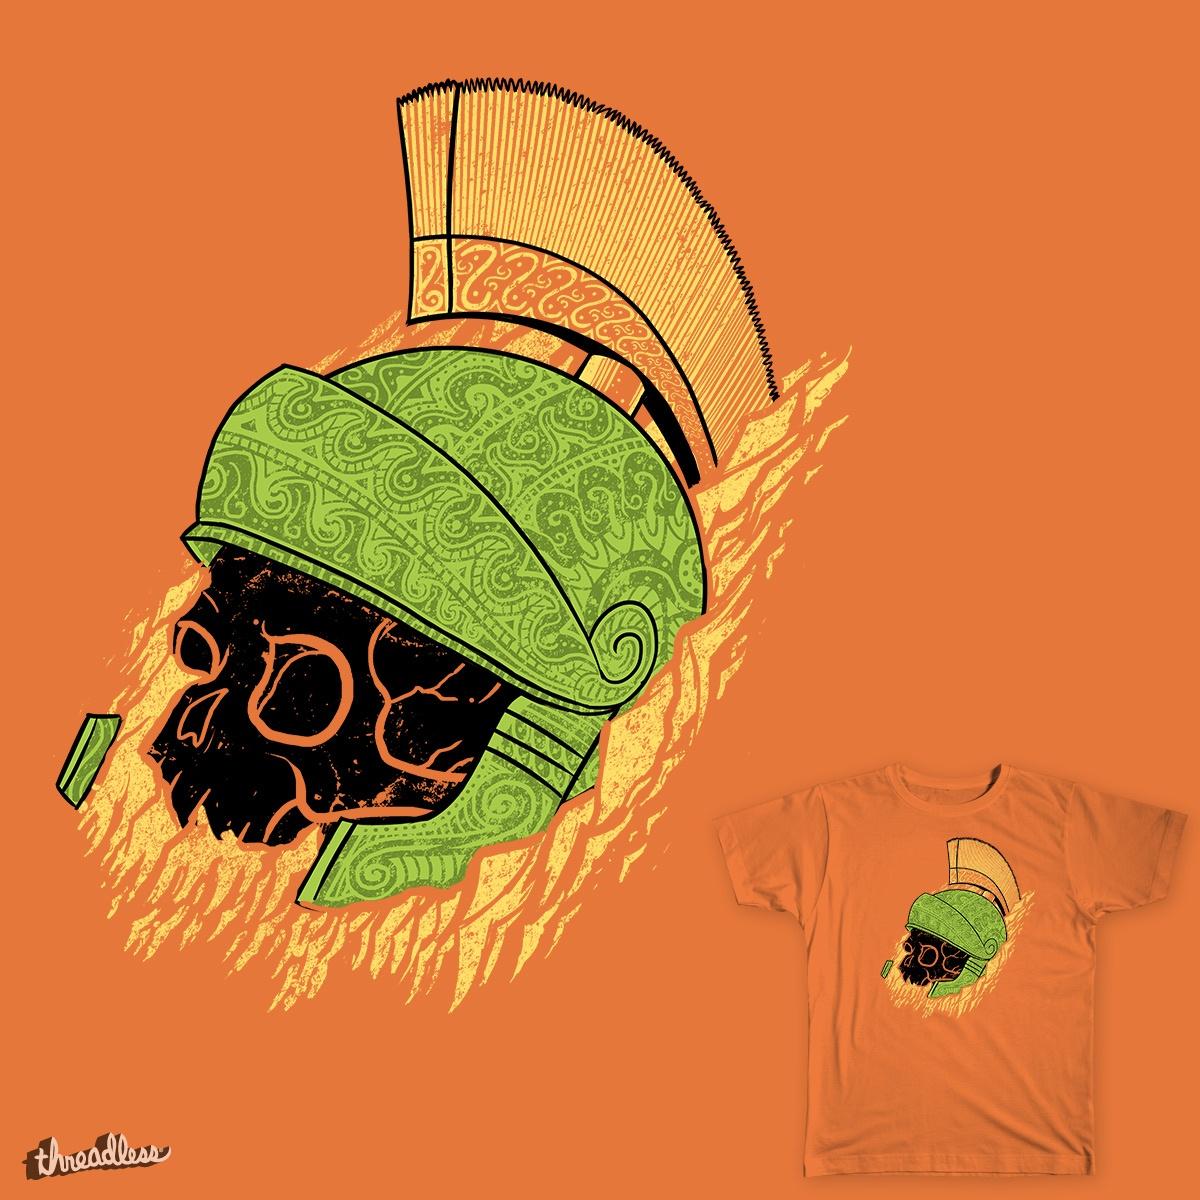 Martian Artifact by Ste7en on Threadless